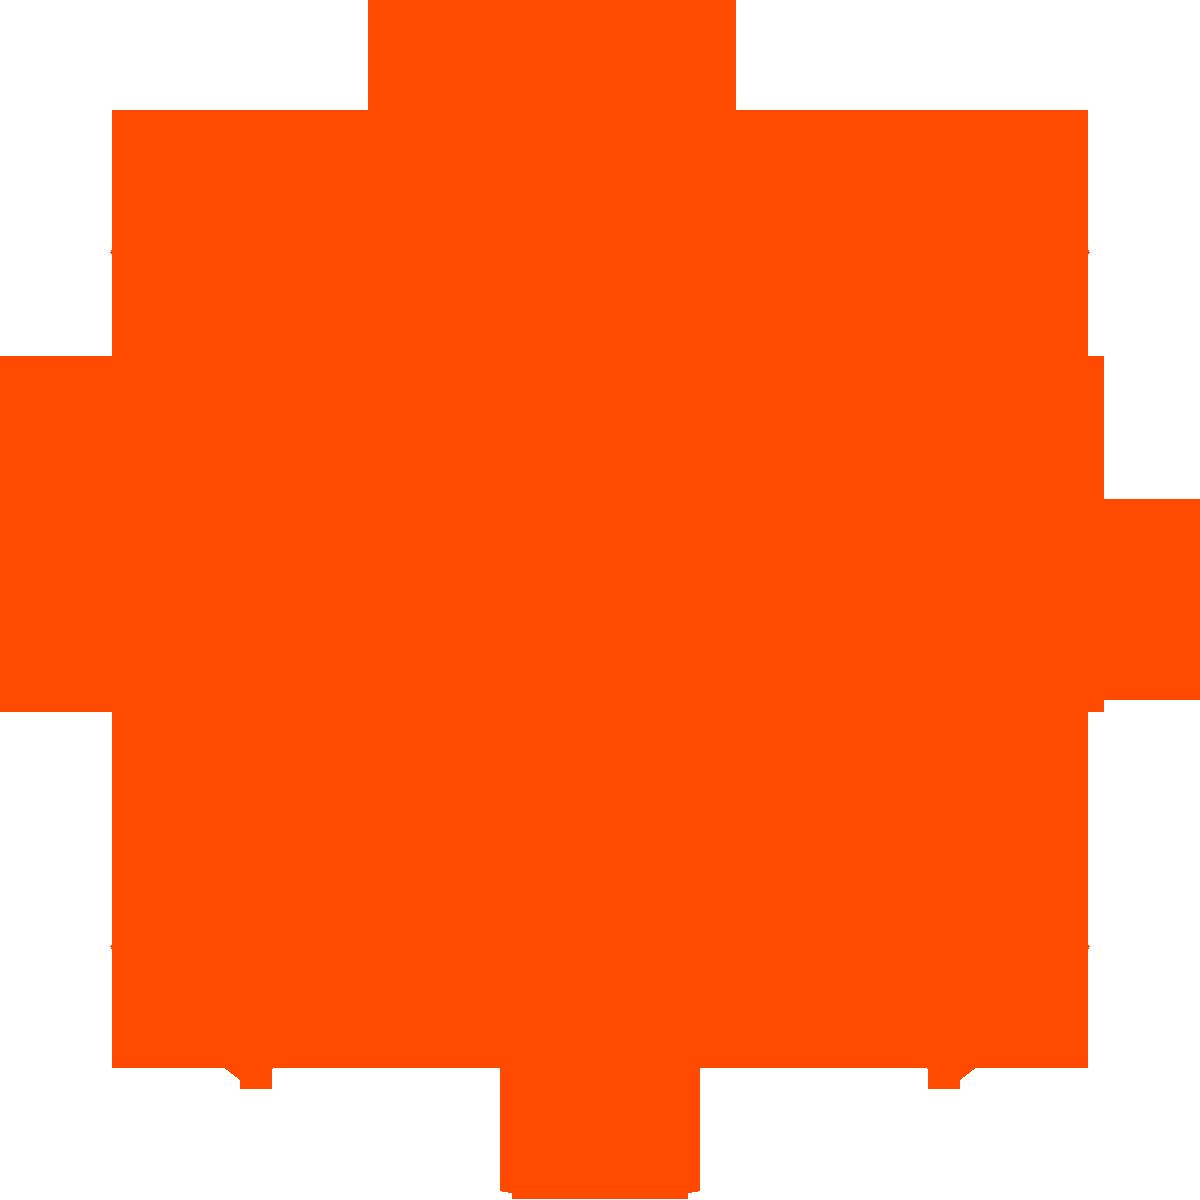 _brand_assets_images_logos_zapier-logomark.png